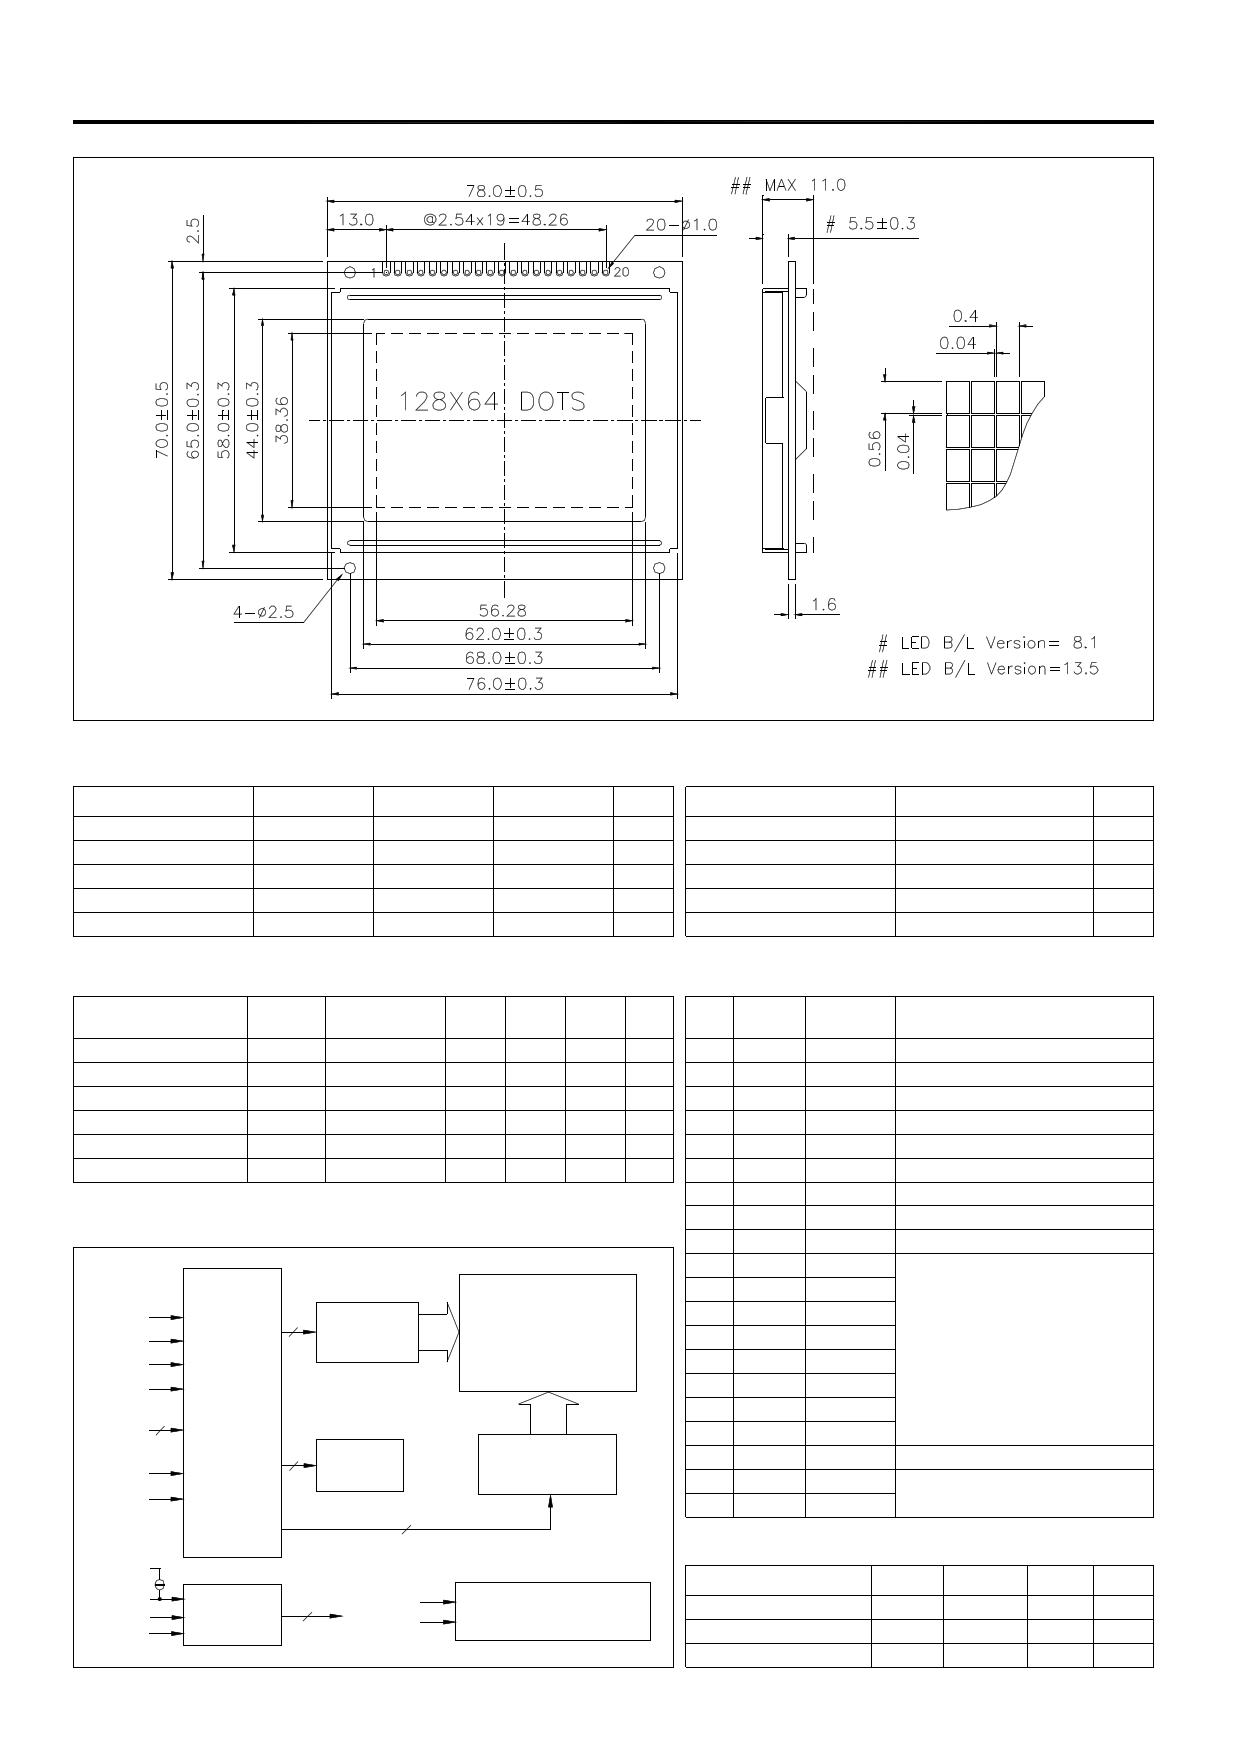 LG128644 데이터시트 및 LG128644 PDF